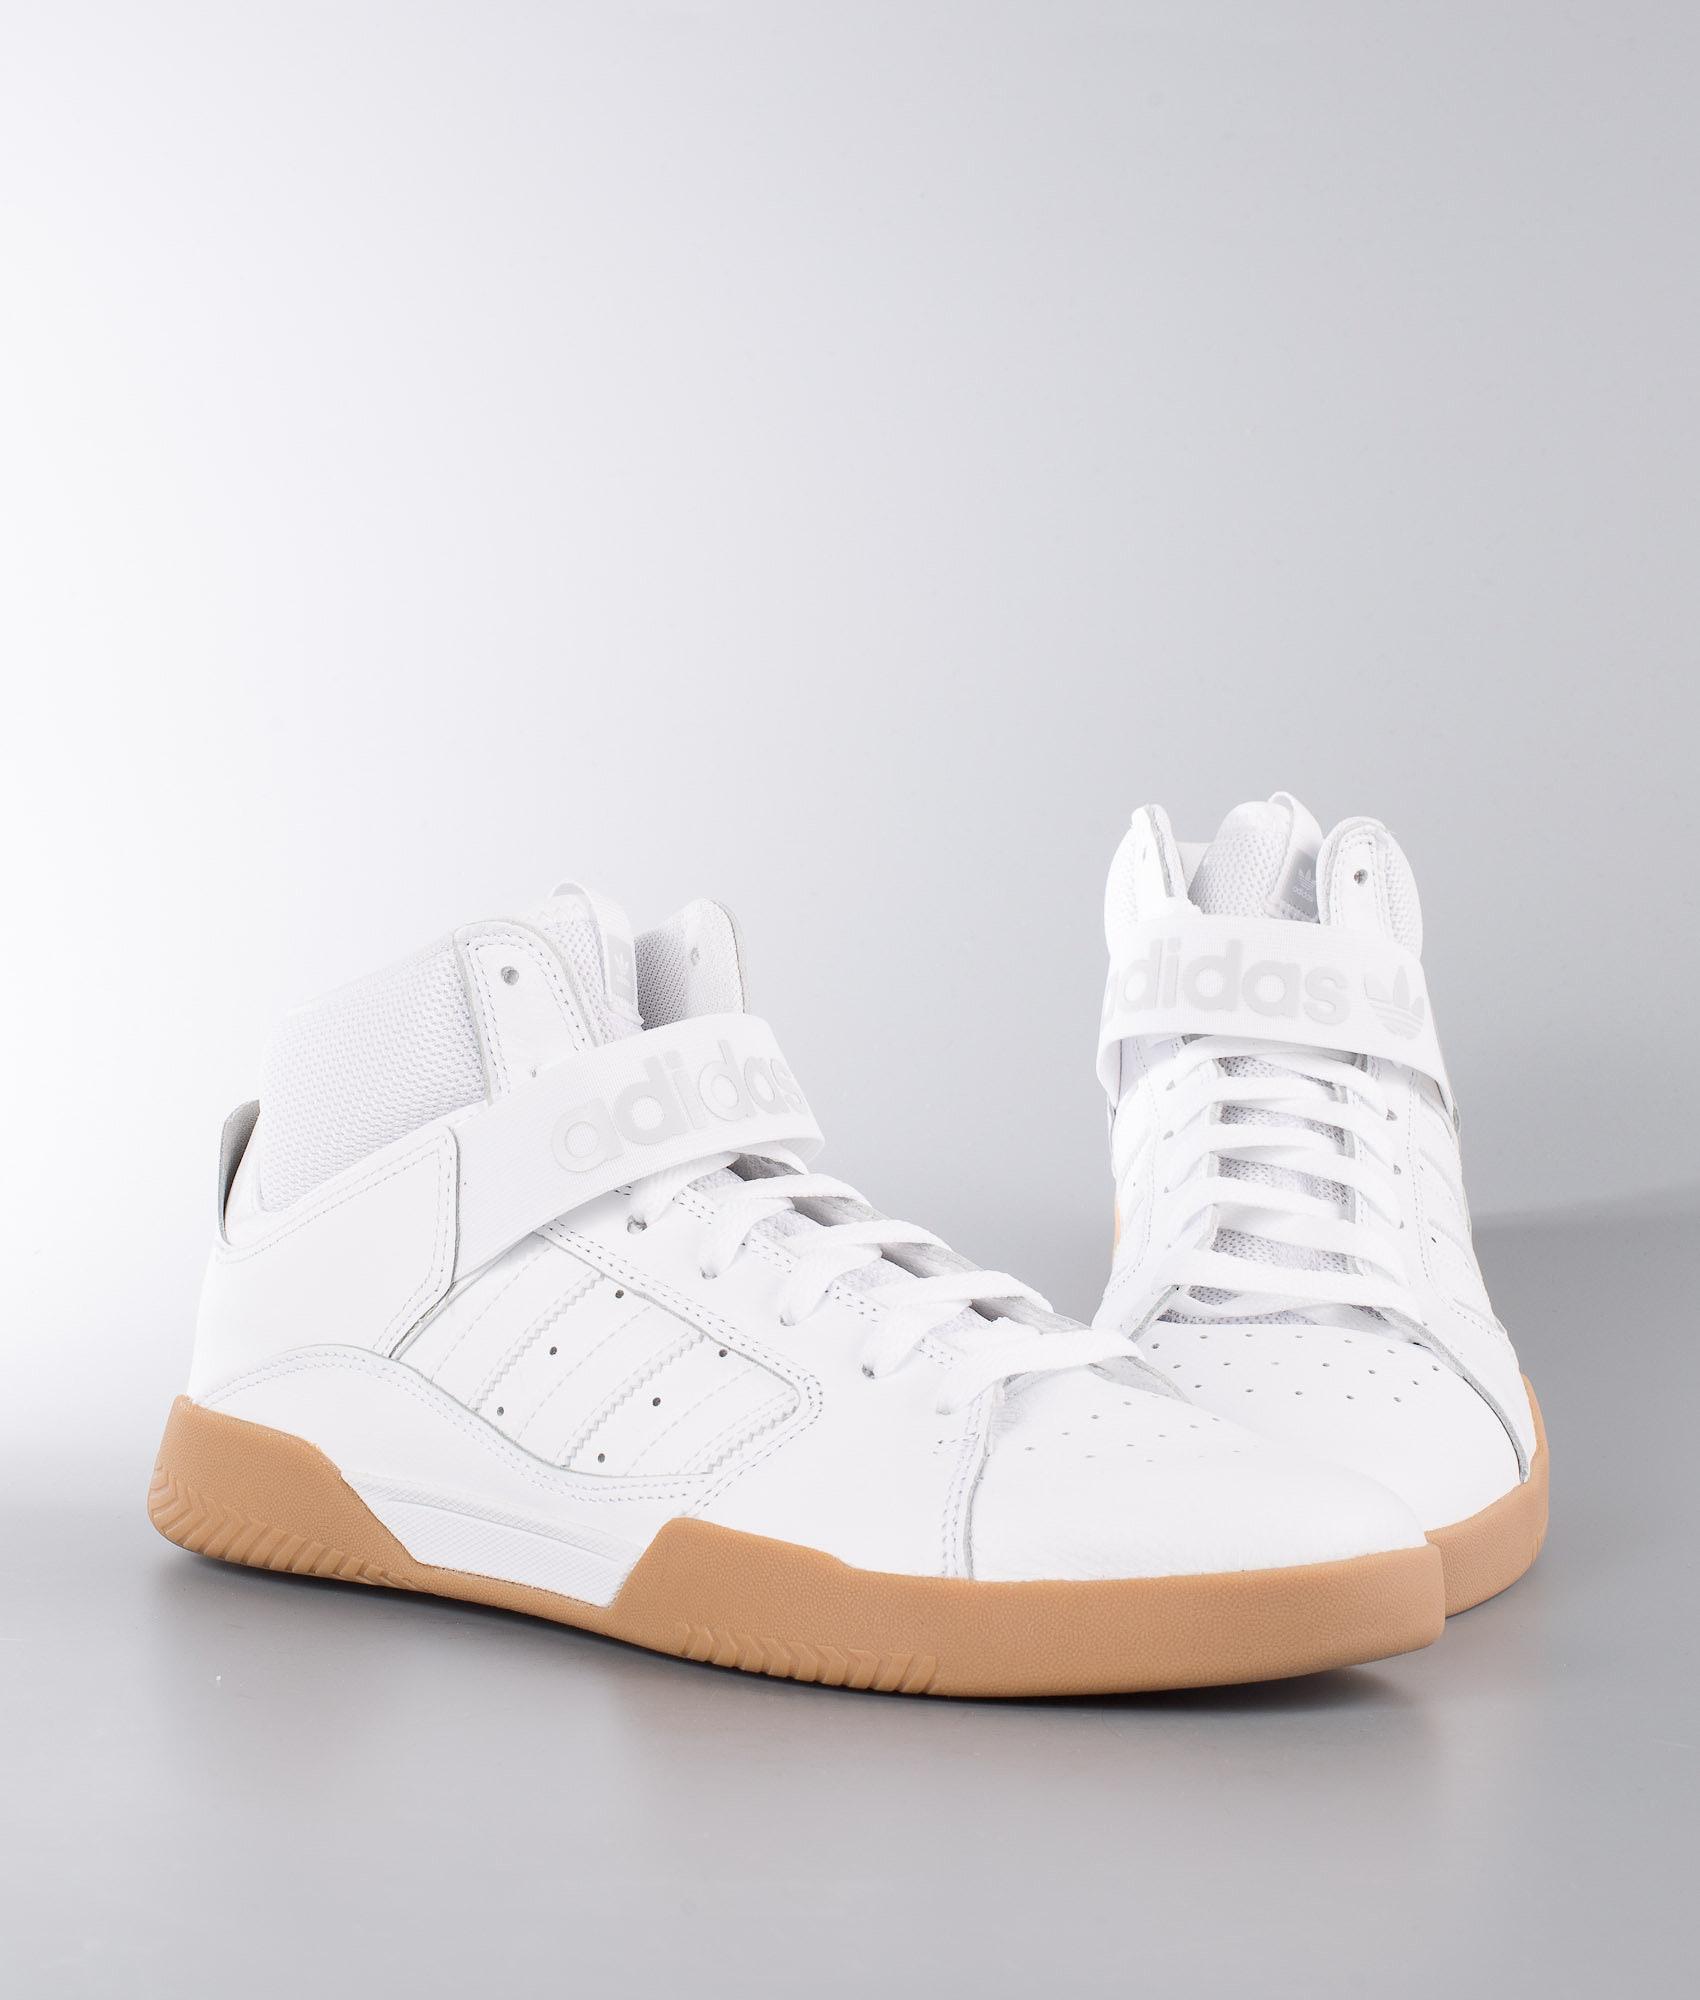 competitive price 5d050 692b1 Adidas Skateboarding VRX Mid Schoenen